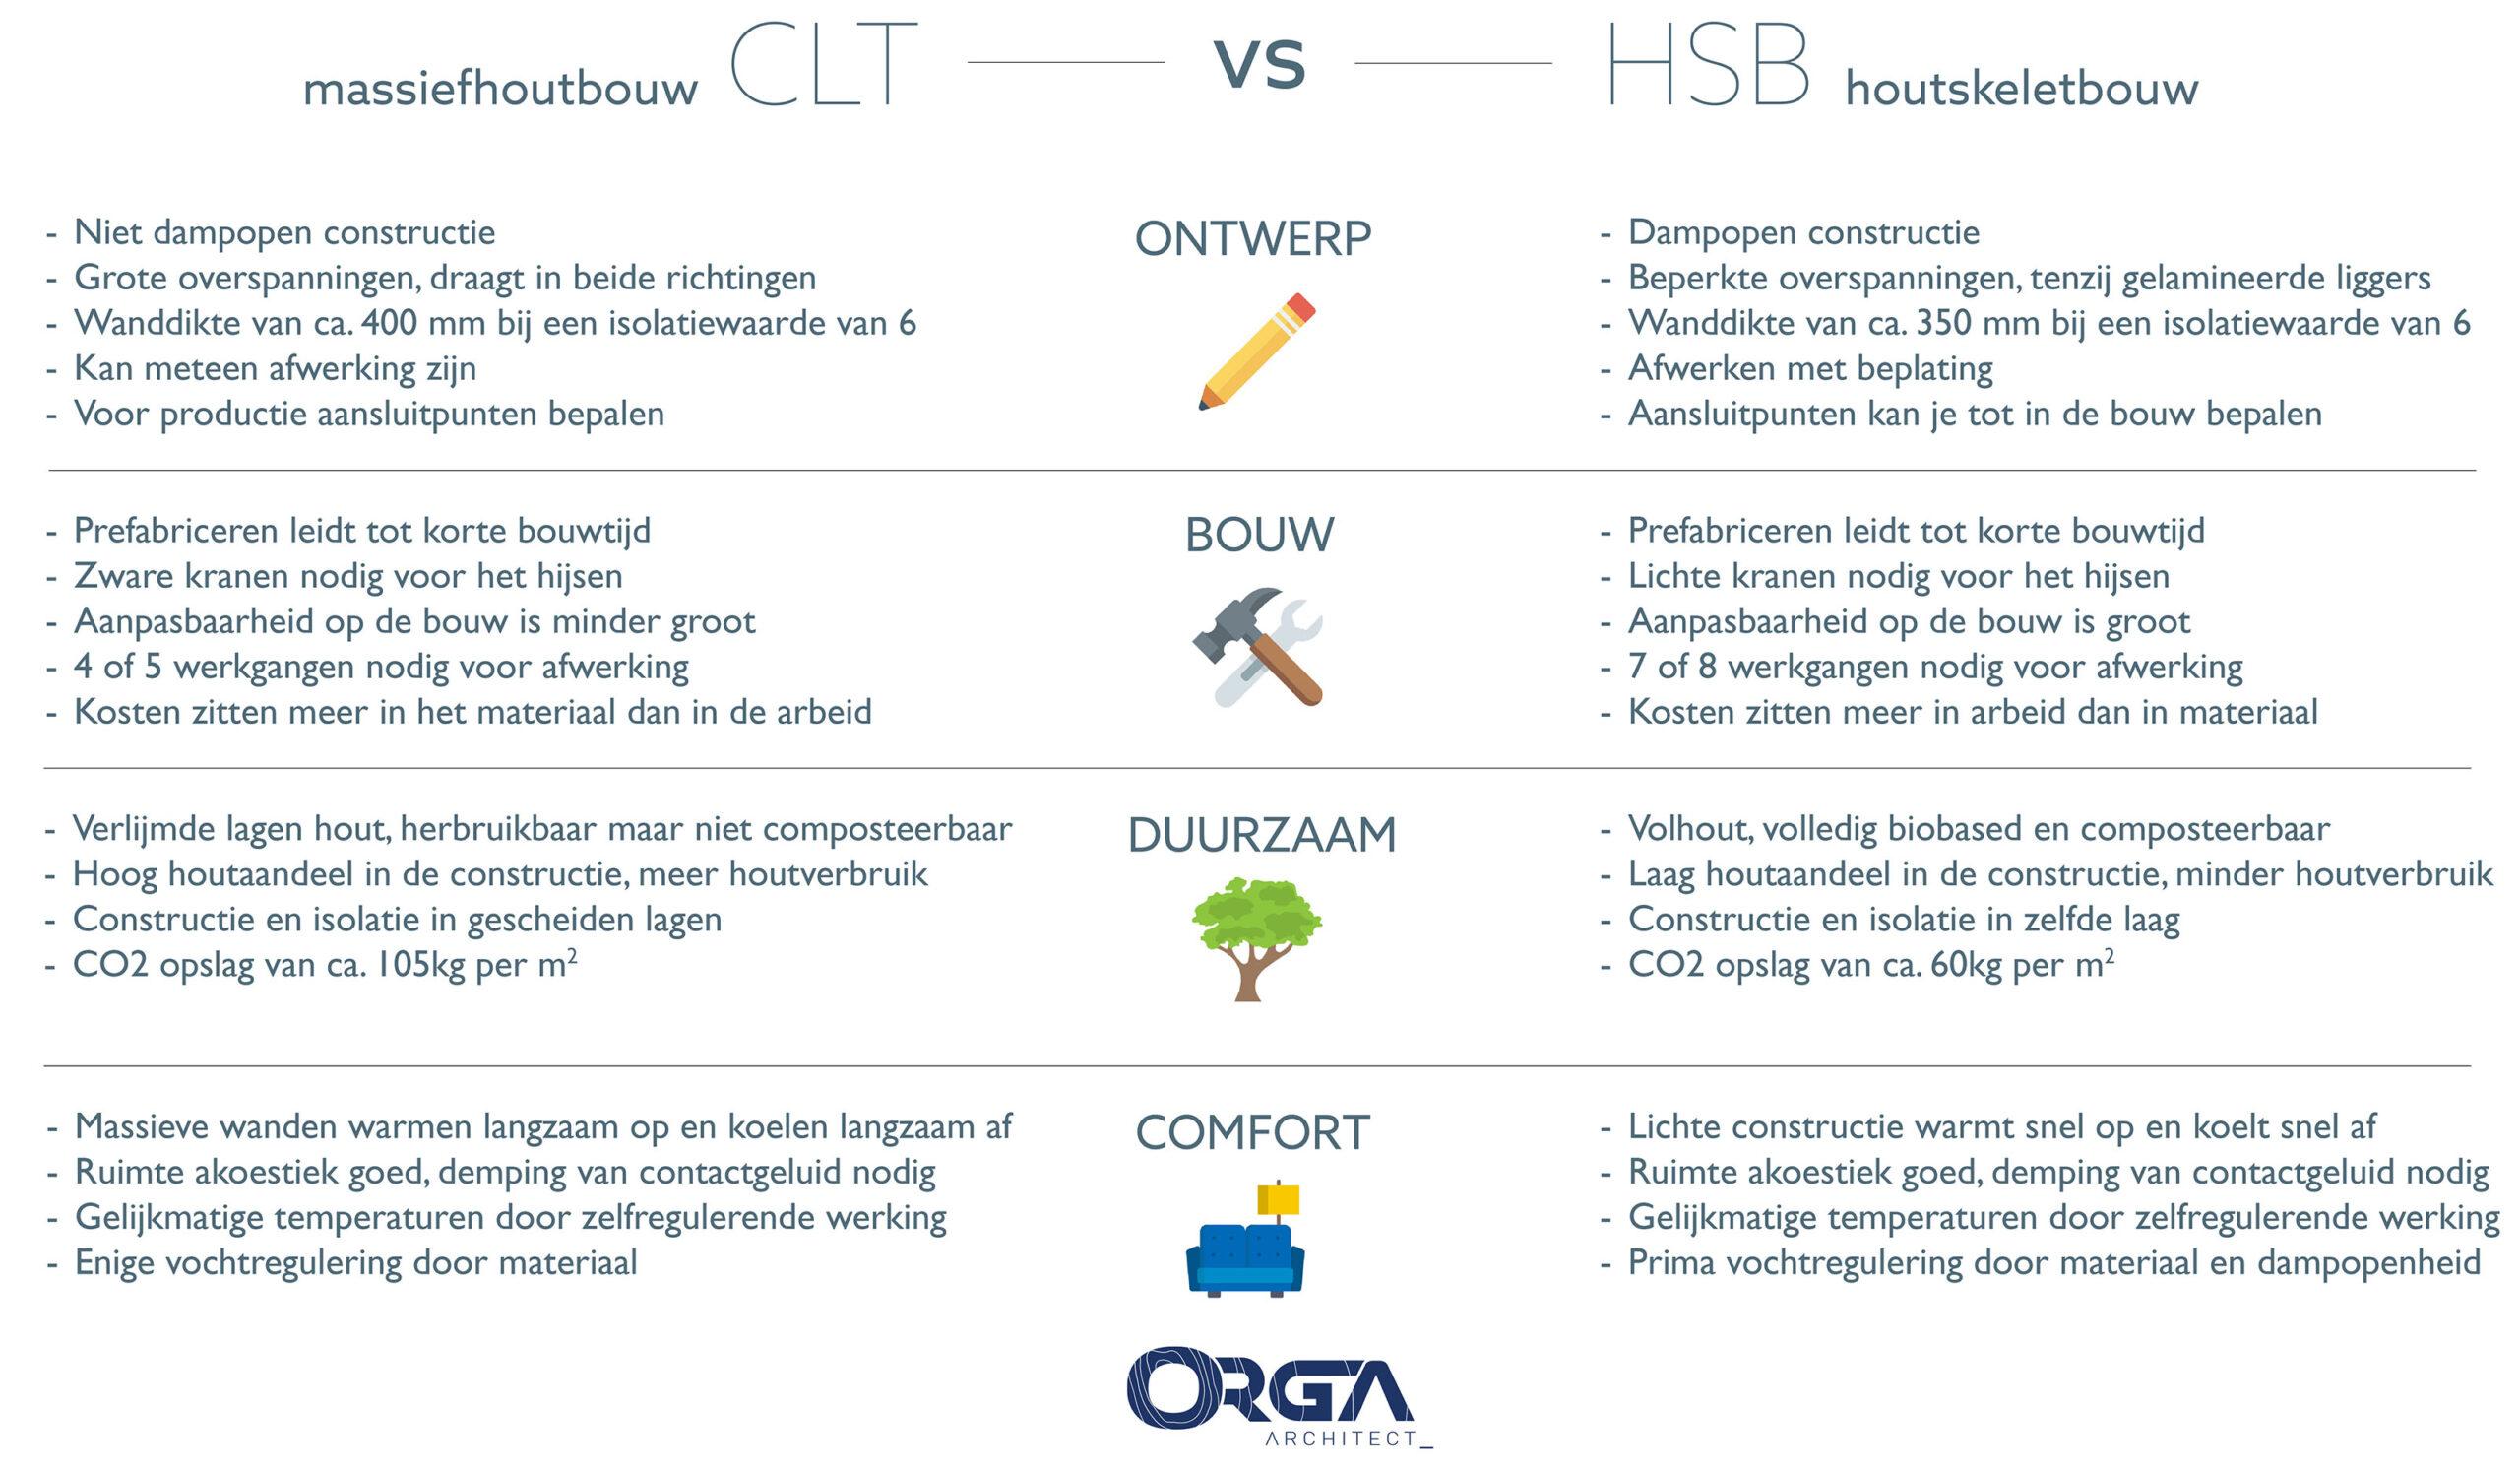 CLT of HSB - ORGA architect